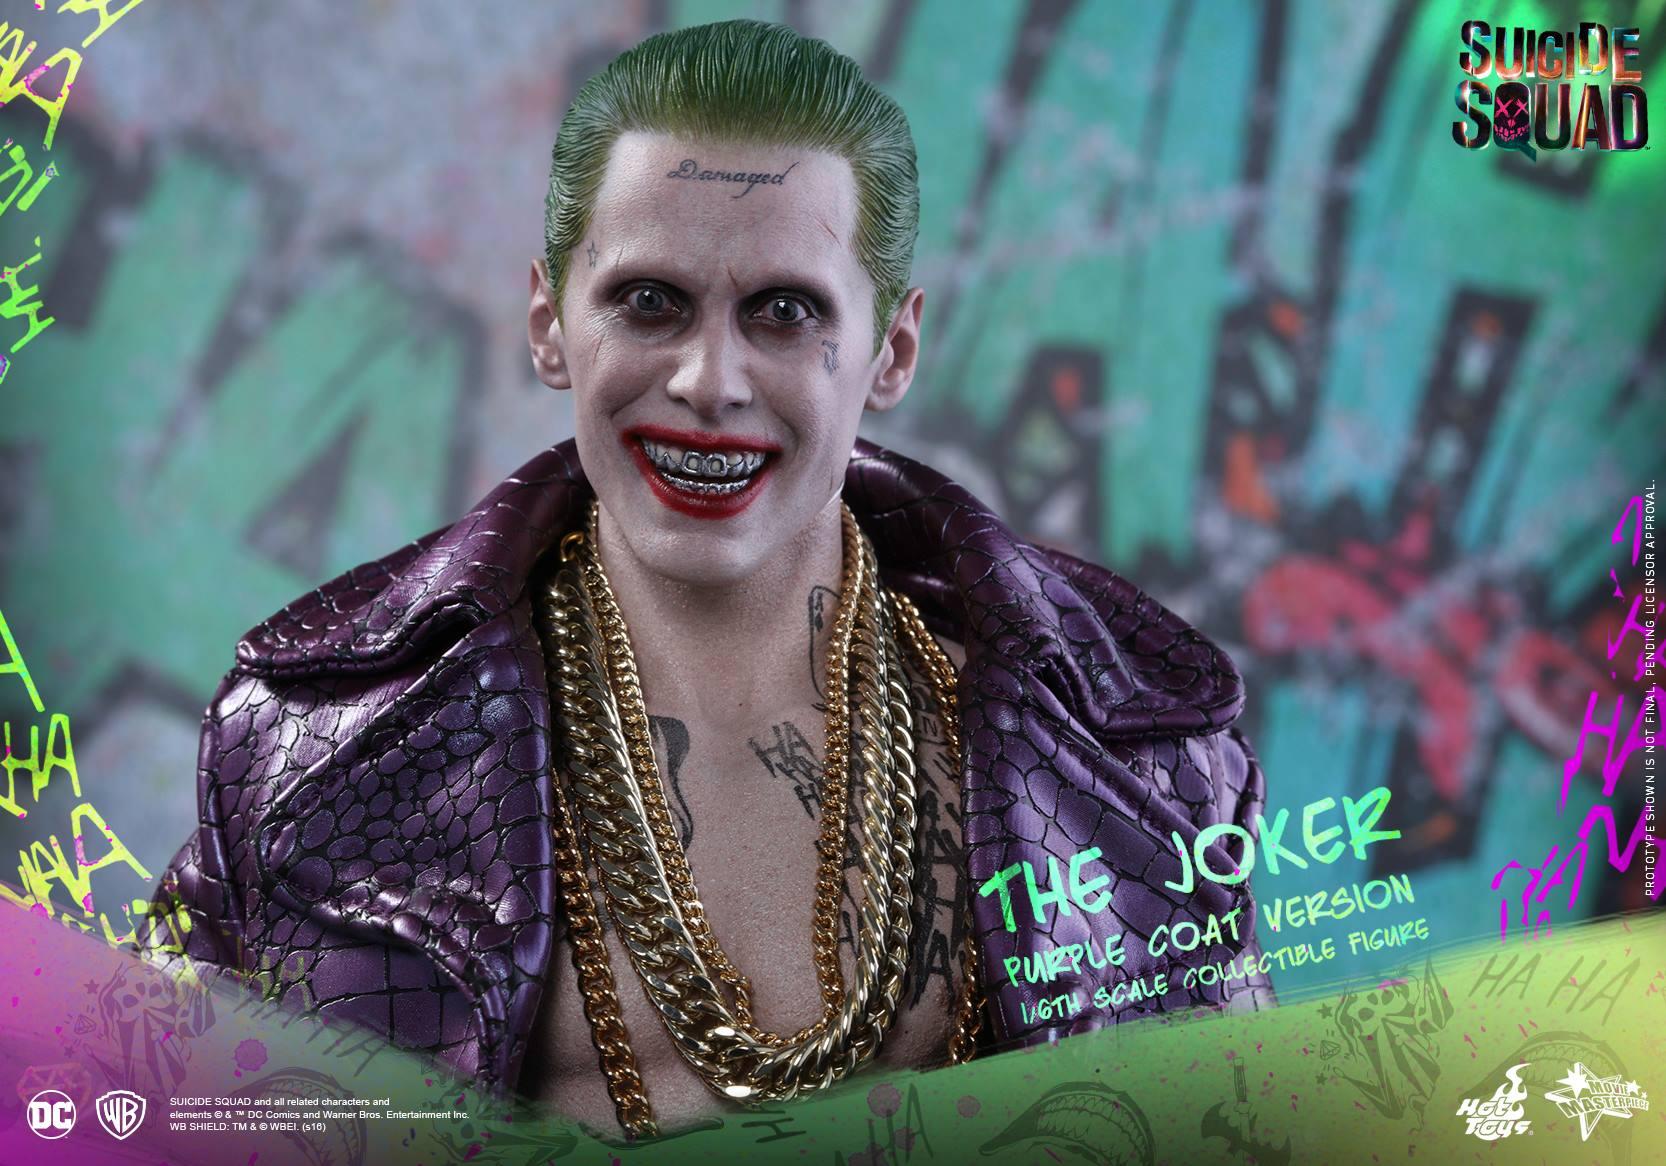 Hot-Toys-Suicide-Squad-Joker-Purple-Coat-4